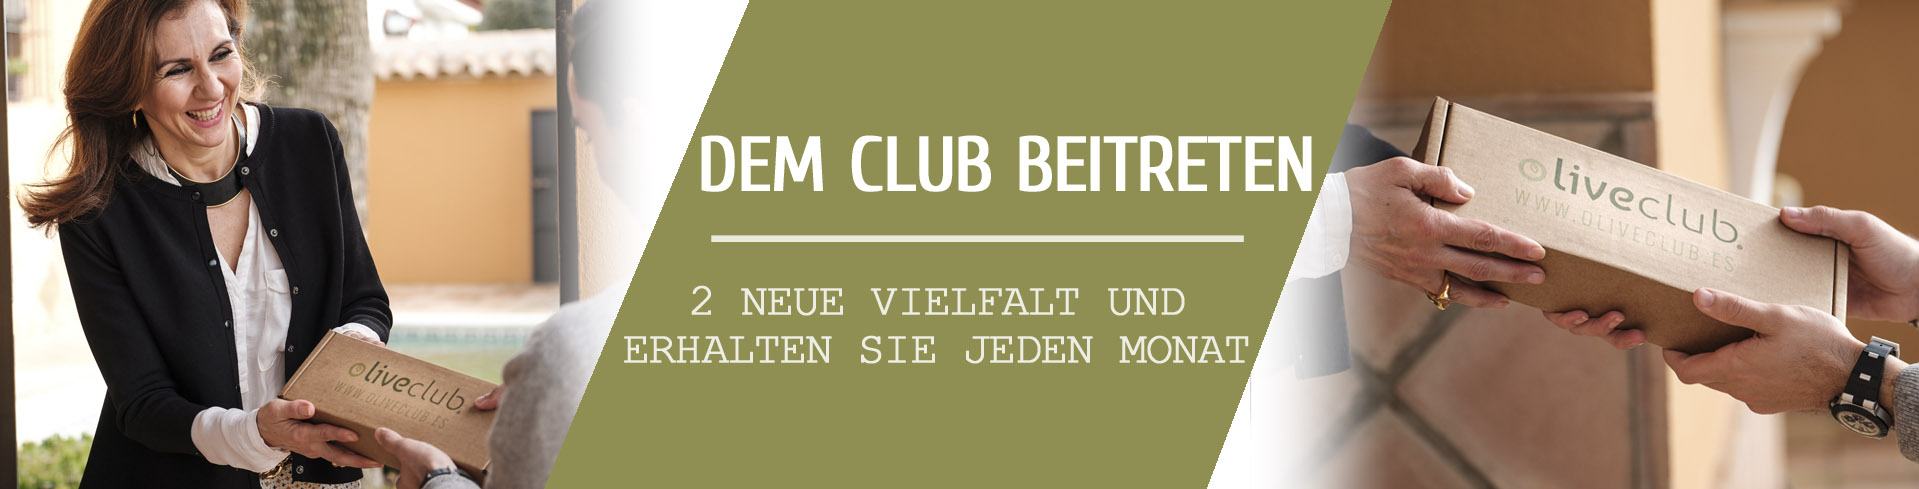 banner-registro_DEU.jpg